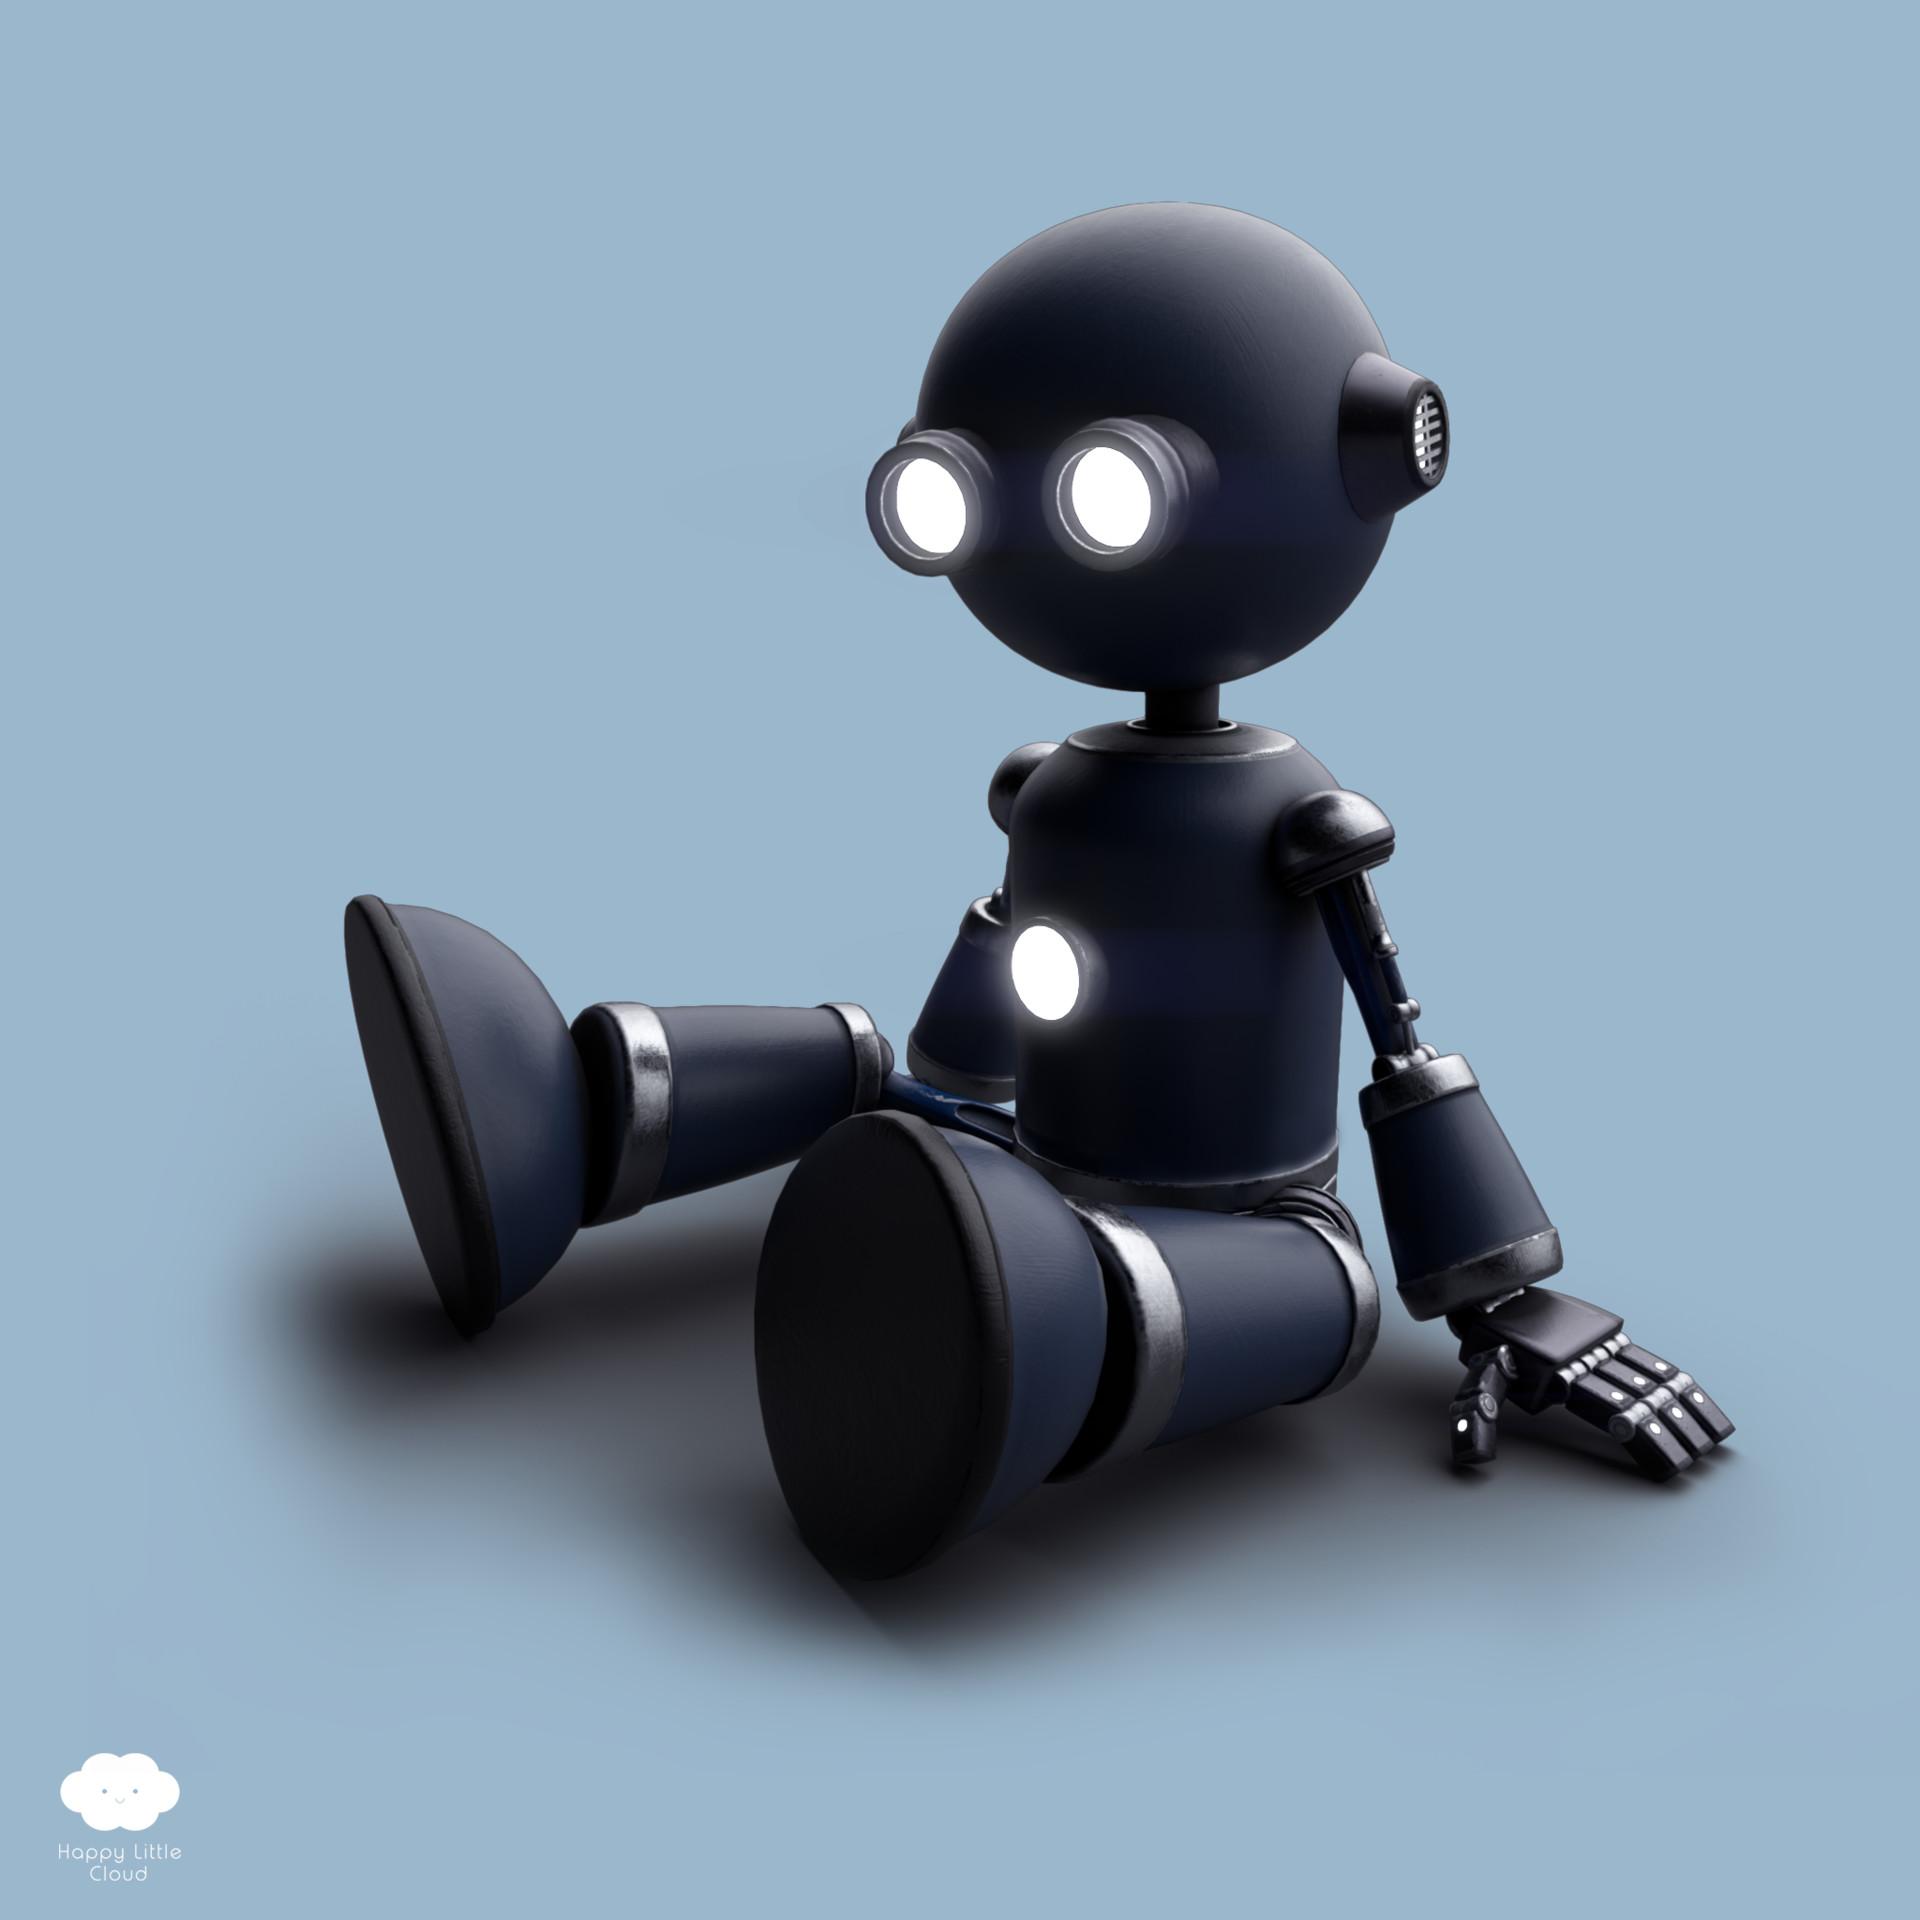 ArtStation - M3 Robot, Happy Little Cloud